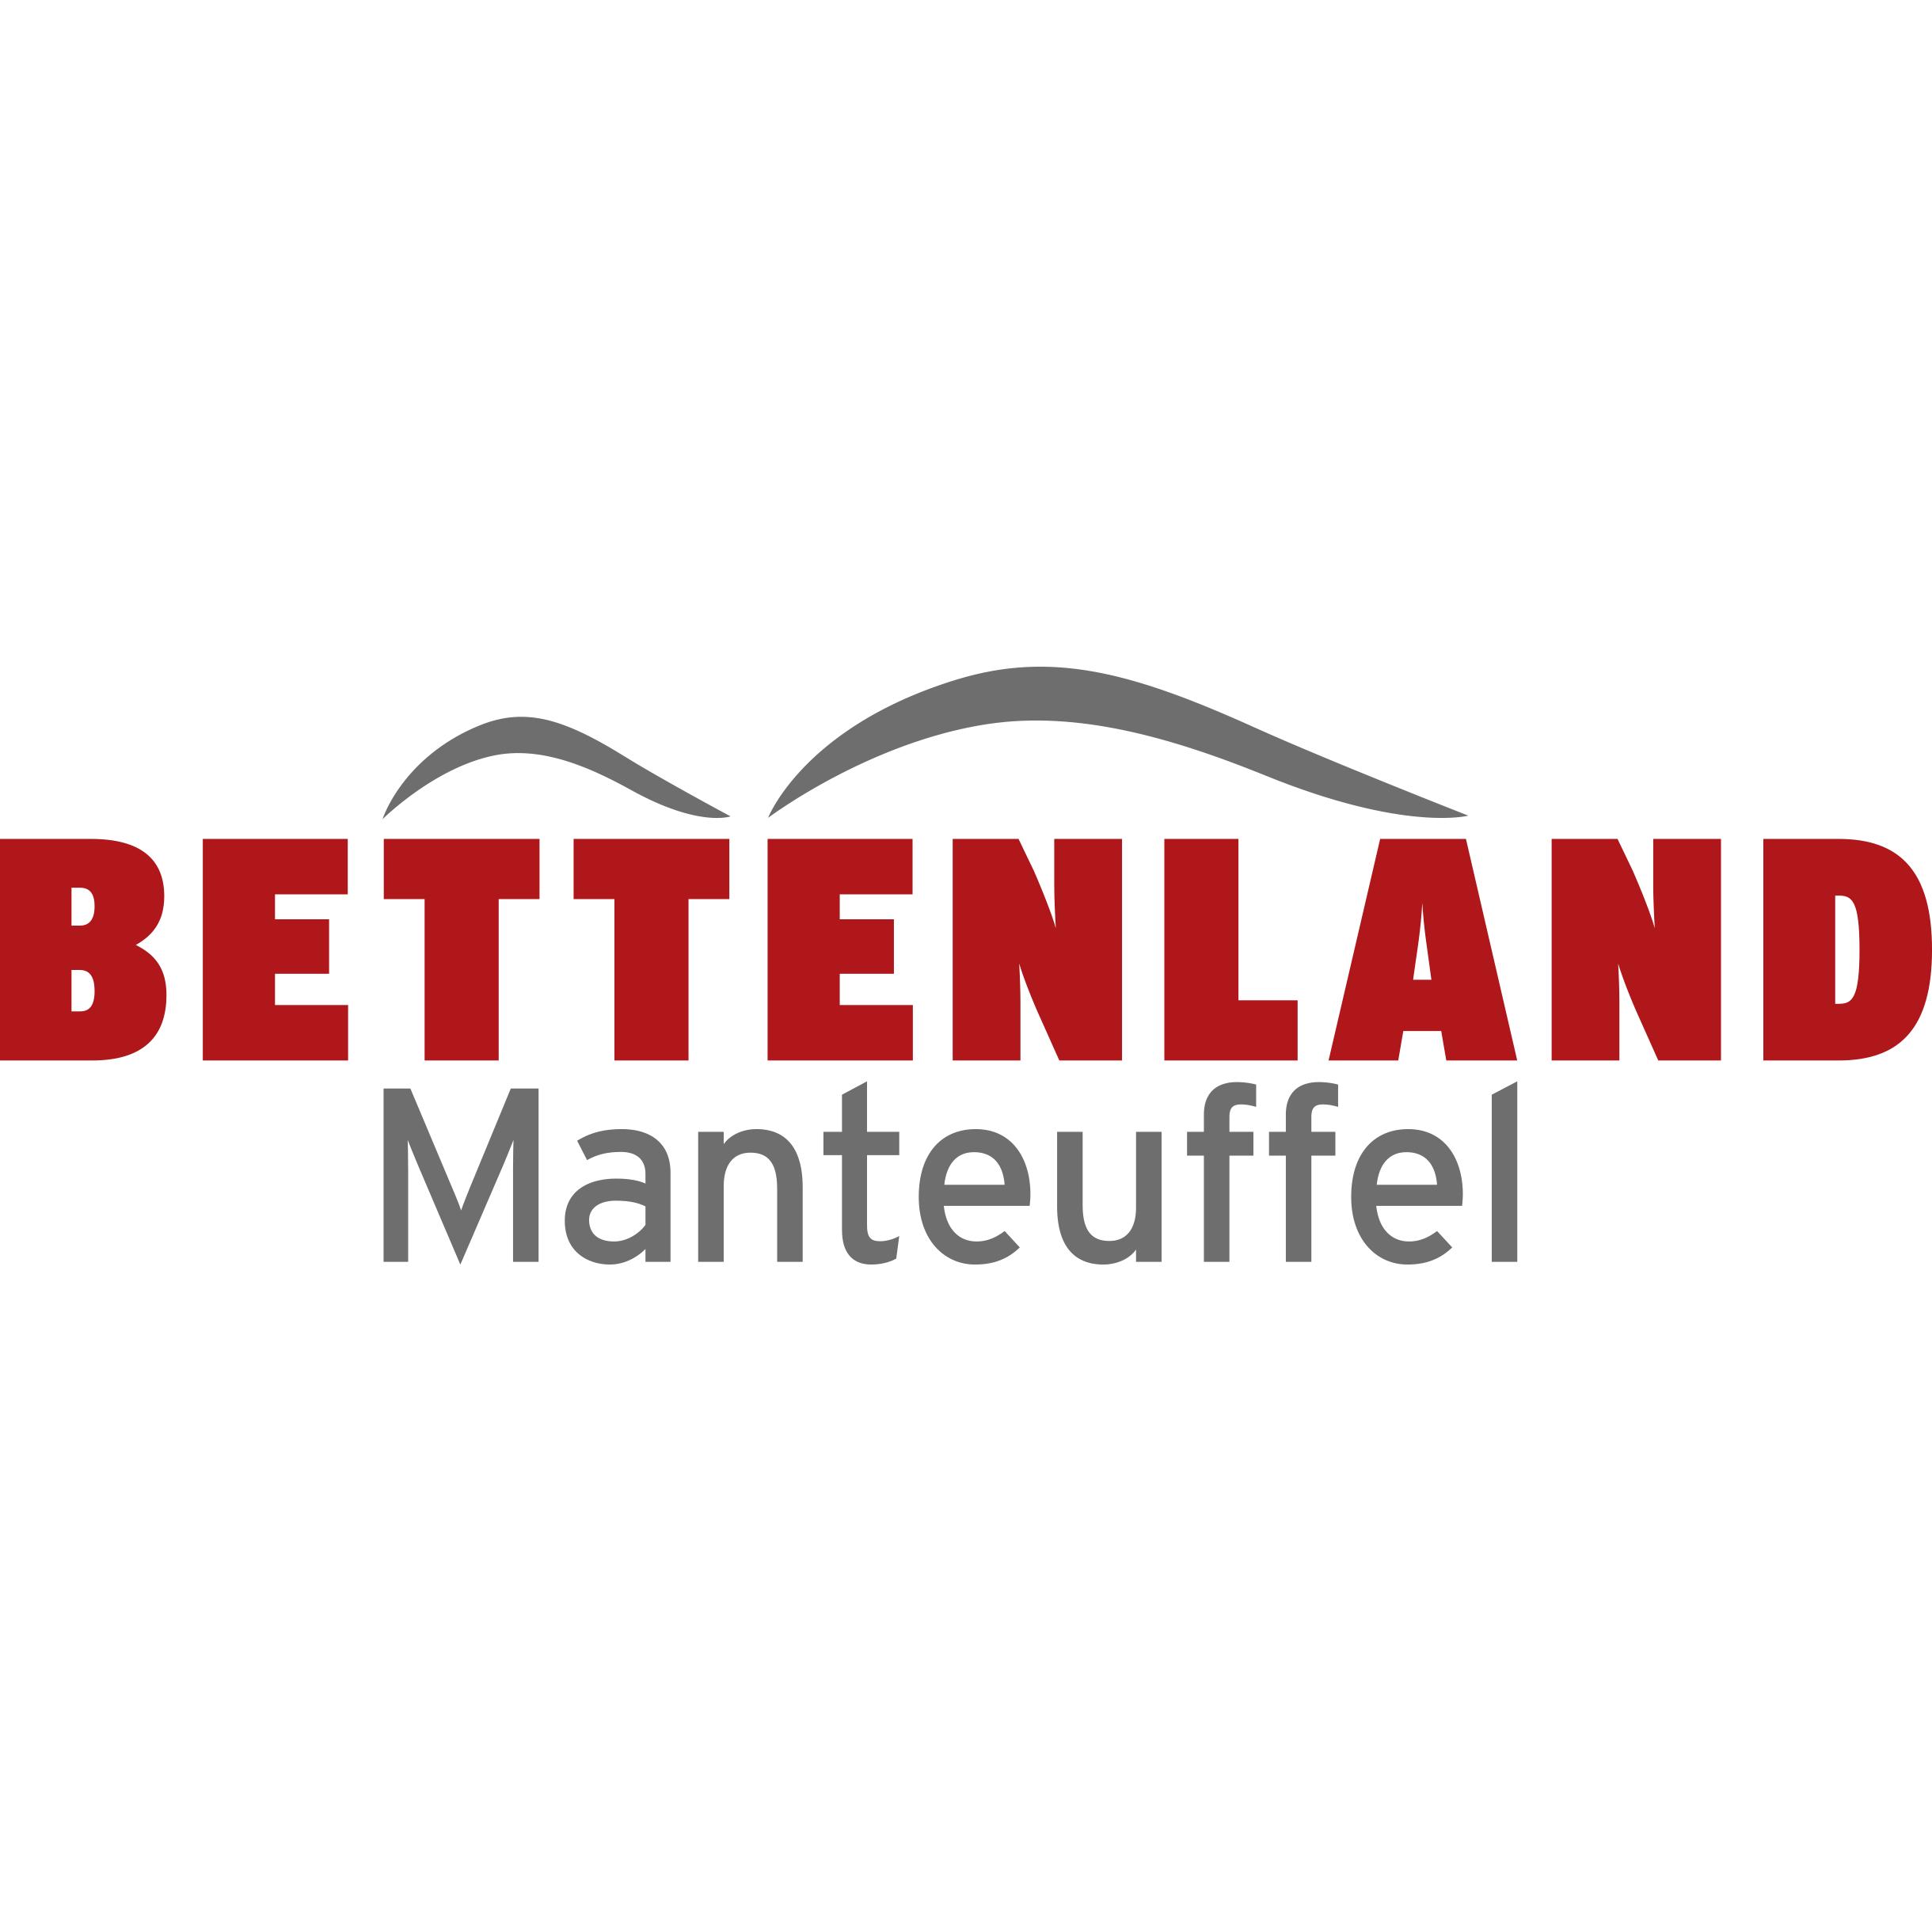 bettenland manteuffel in marl bergstra e 145. Black Bedroom Furniture Sets. Home Design Ideas